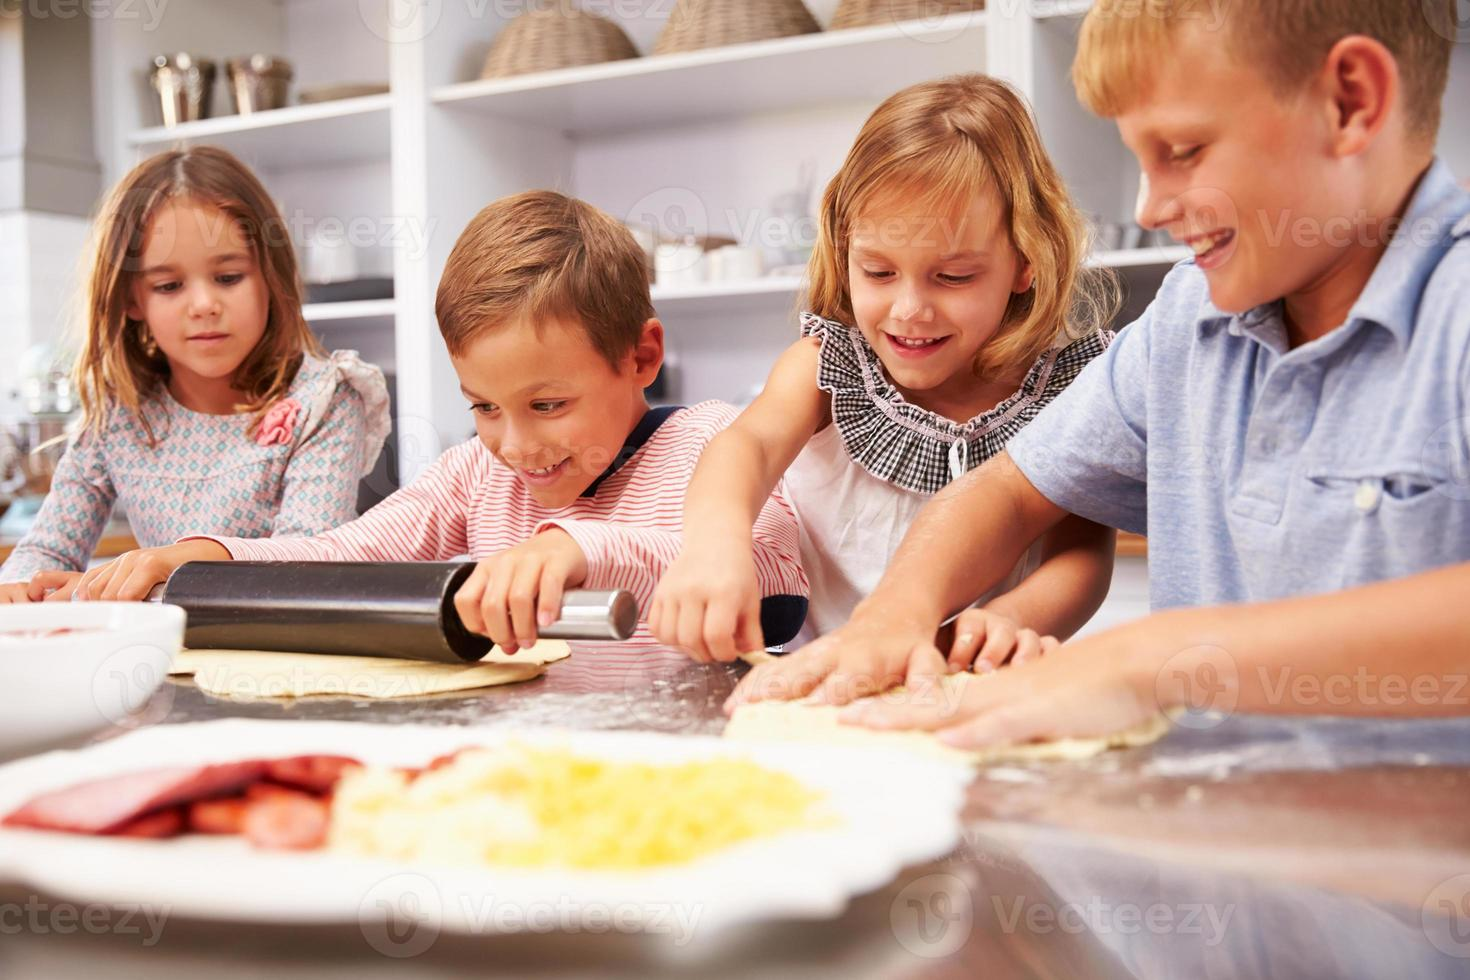 Children making pizza together photo